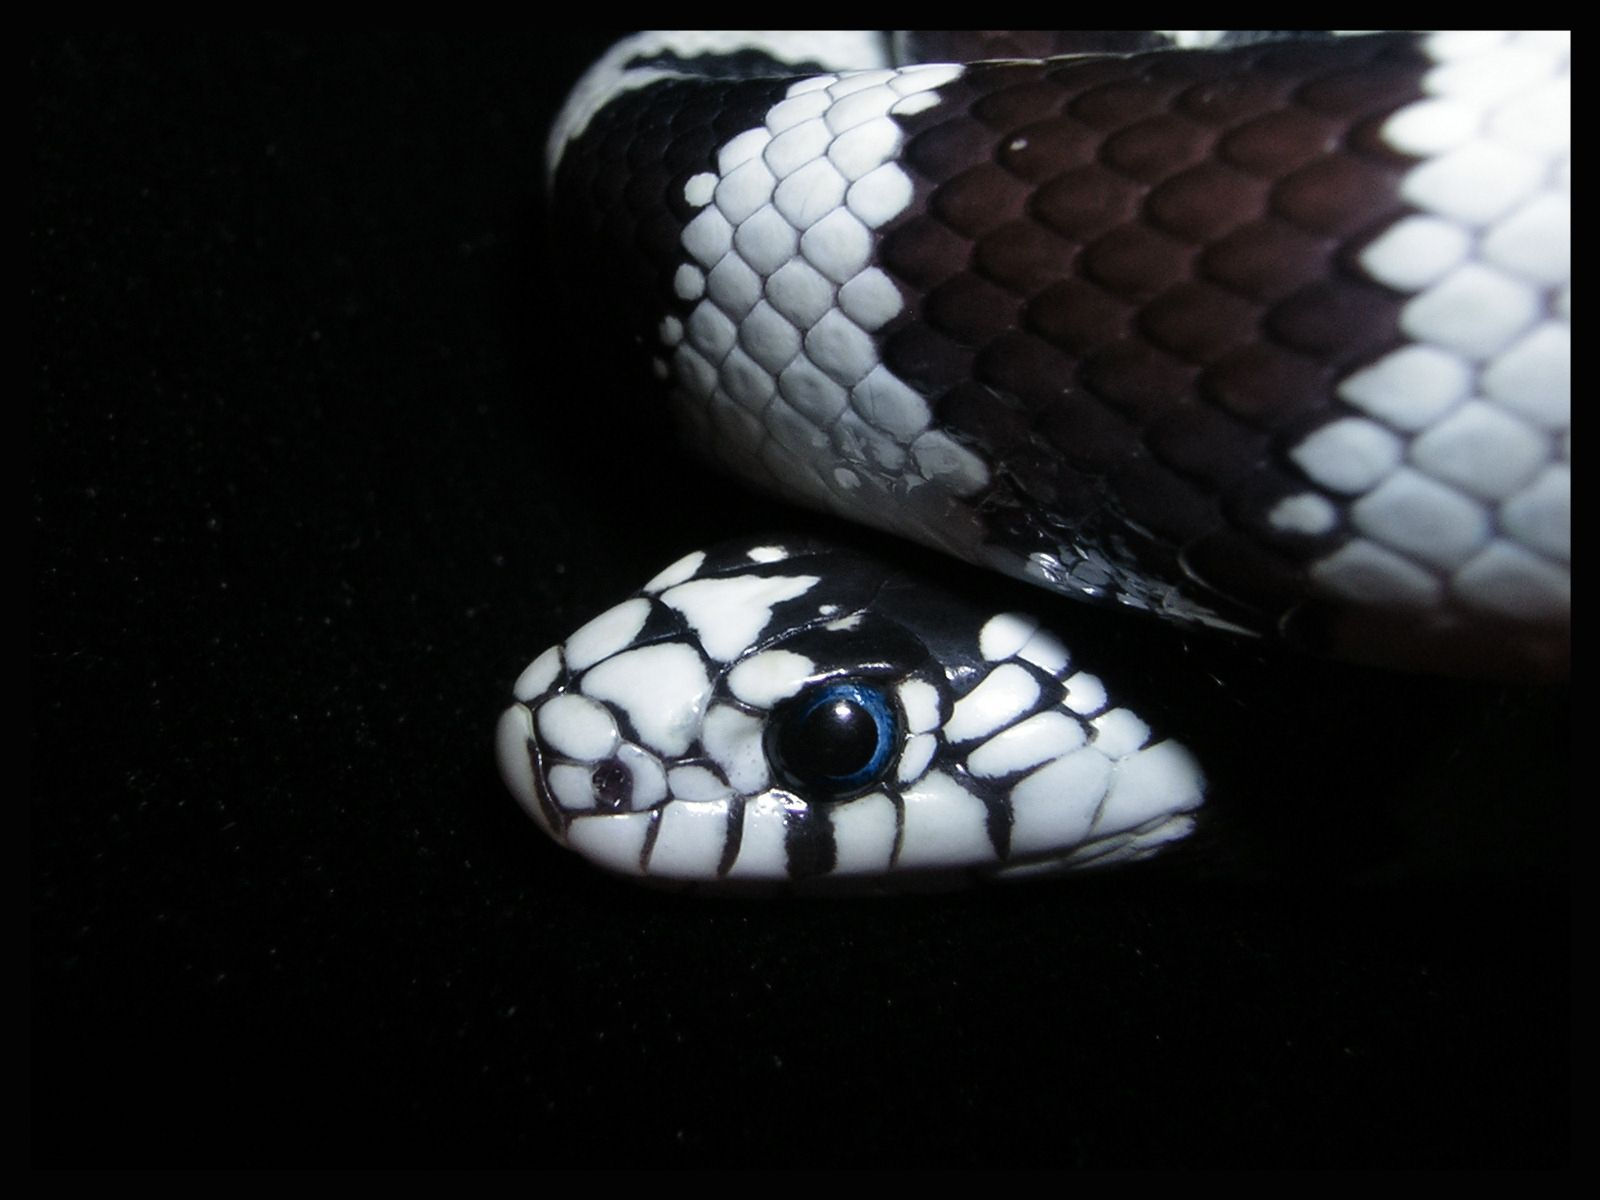 HD Snake Wallpaper 1920x1080 Black Wallpapers 43